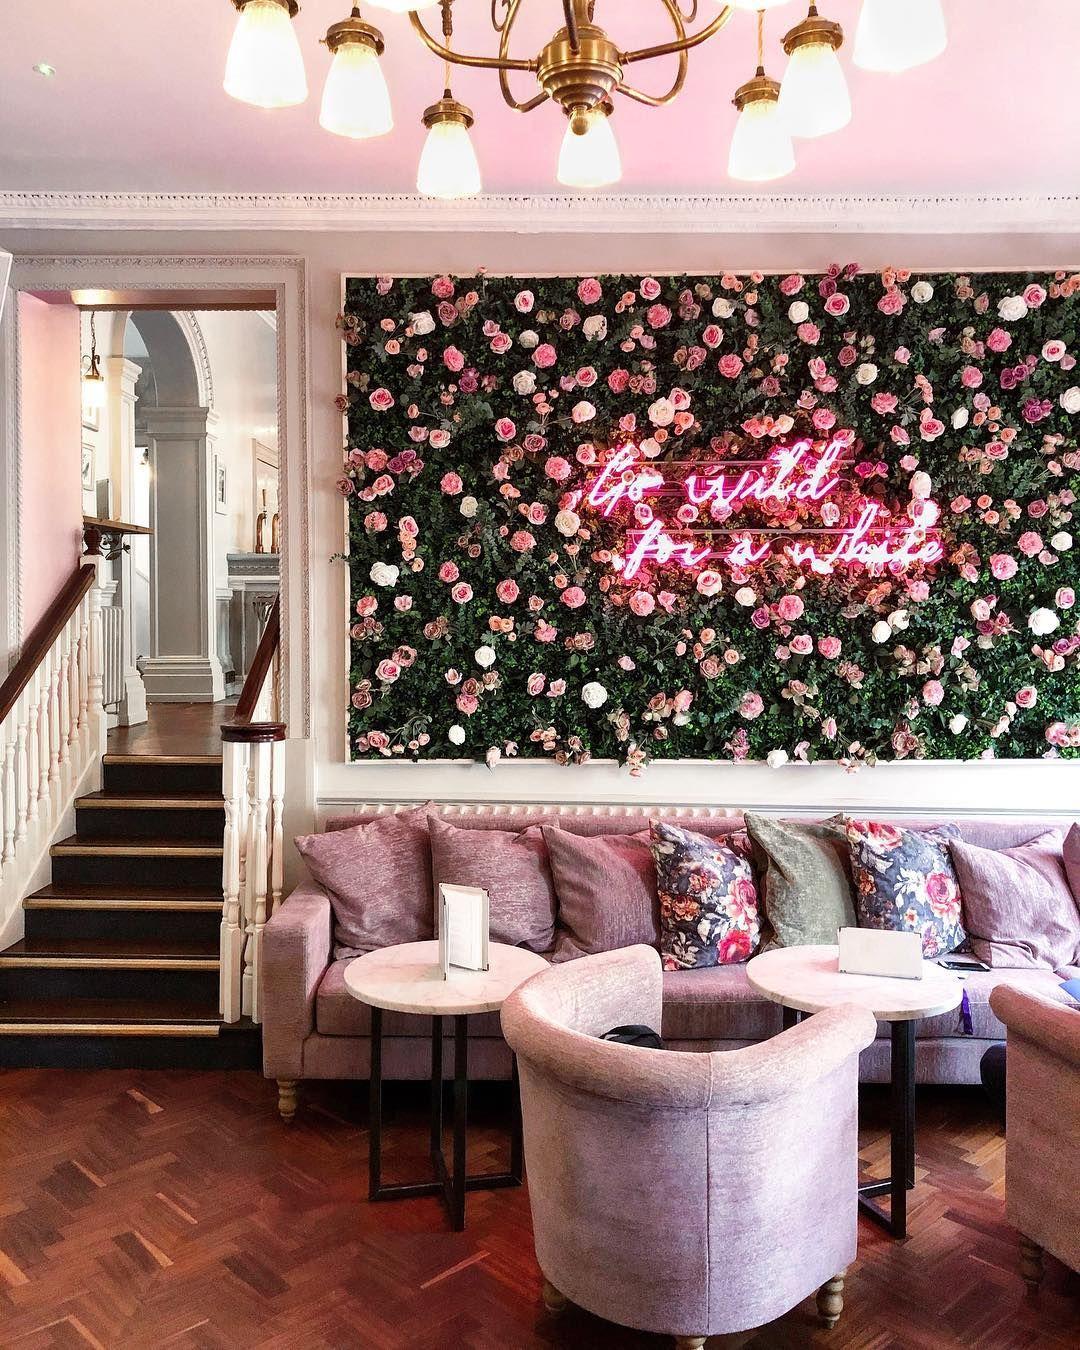 The Florist Bristol Instagram Photos And Videos Room Decor Decor Cafe Interior Design